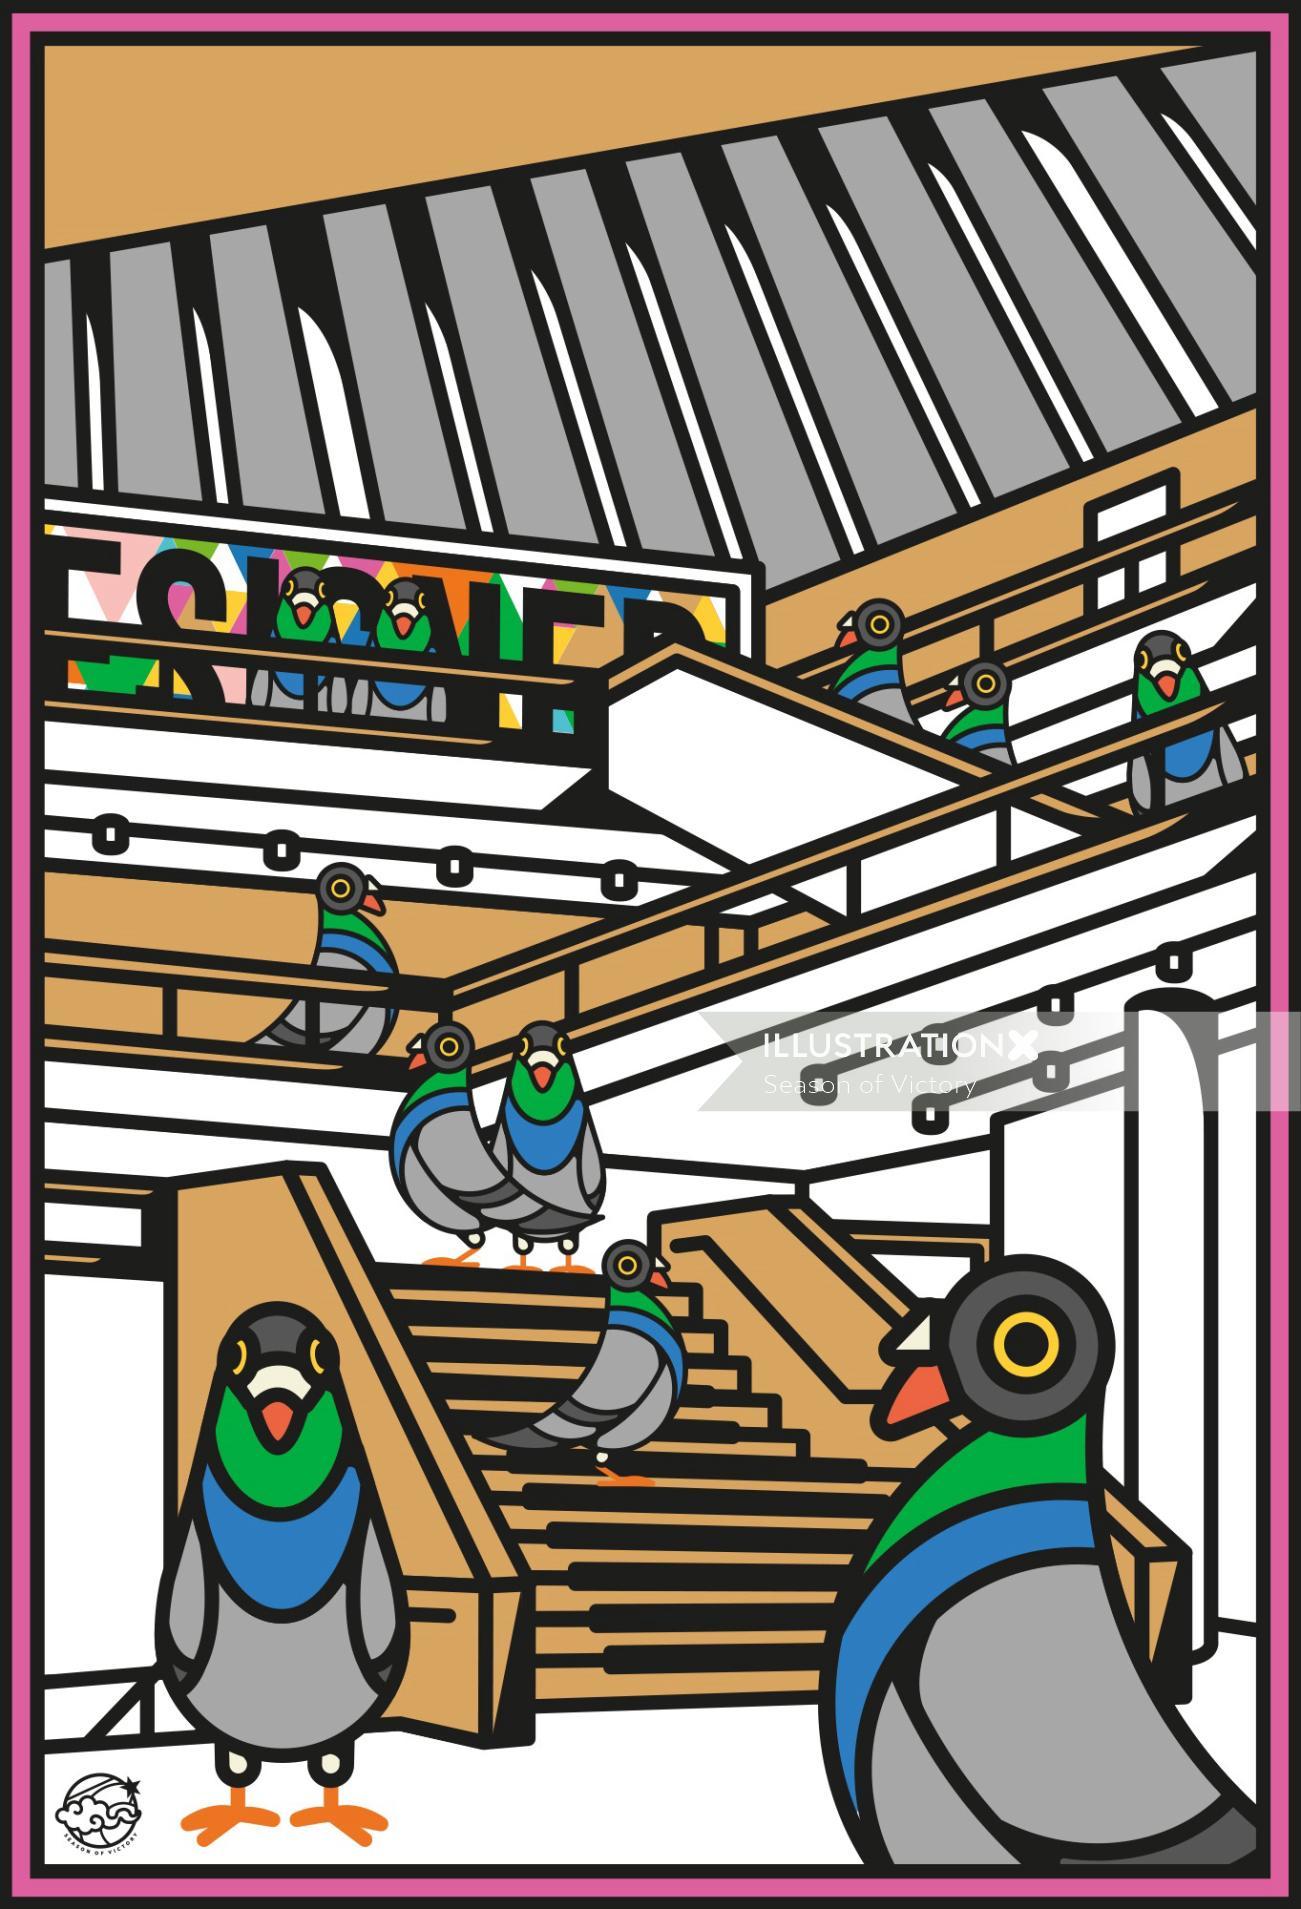 pigeon, pigeons, london, london skyline, buildings, london city scene, city scene, city, city scene,